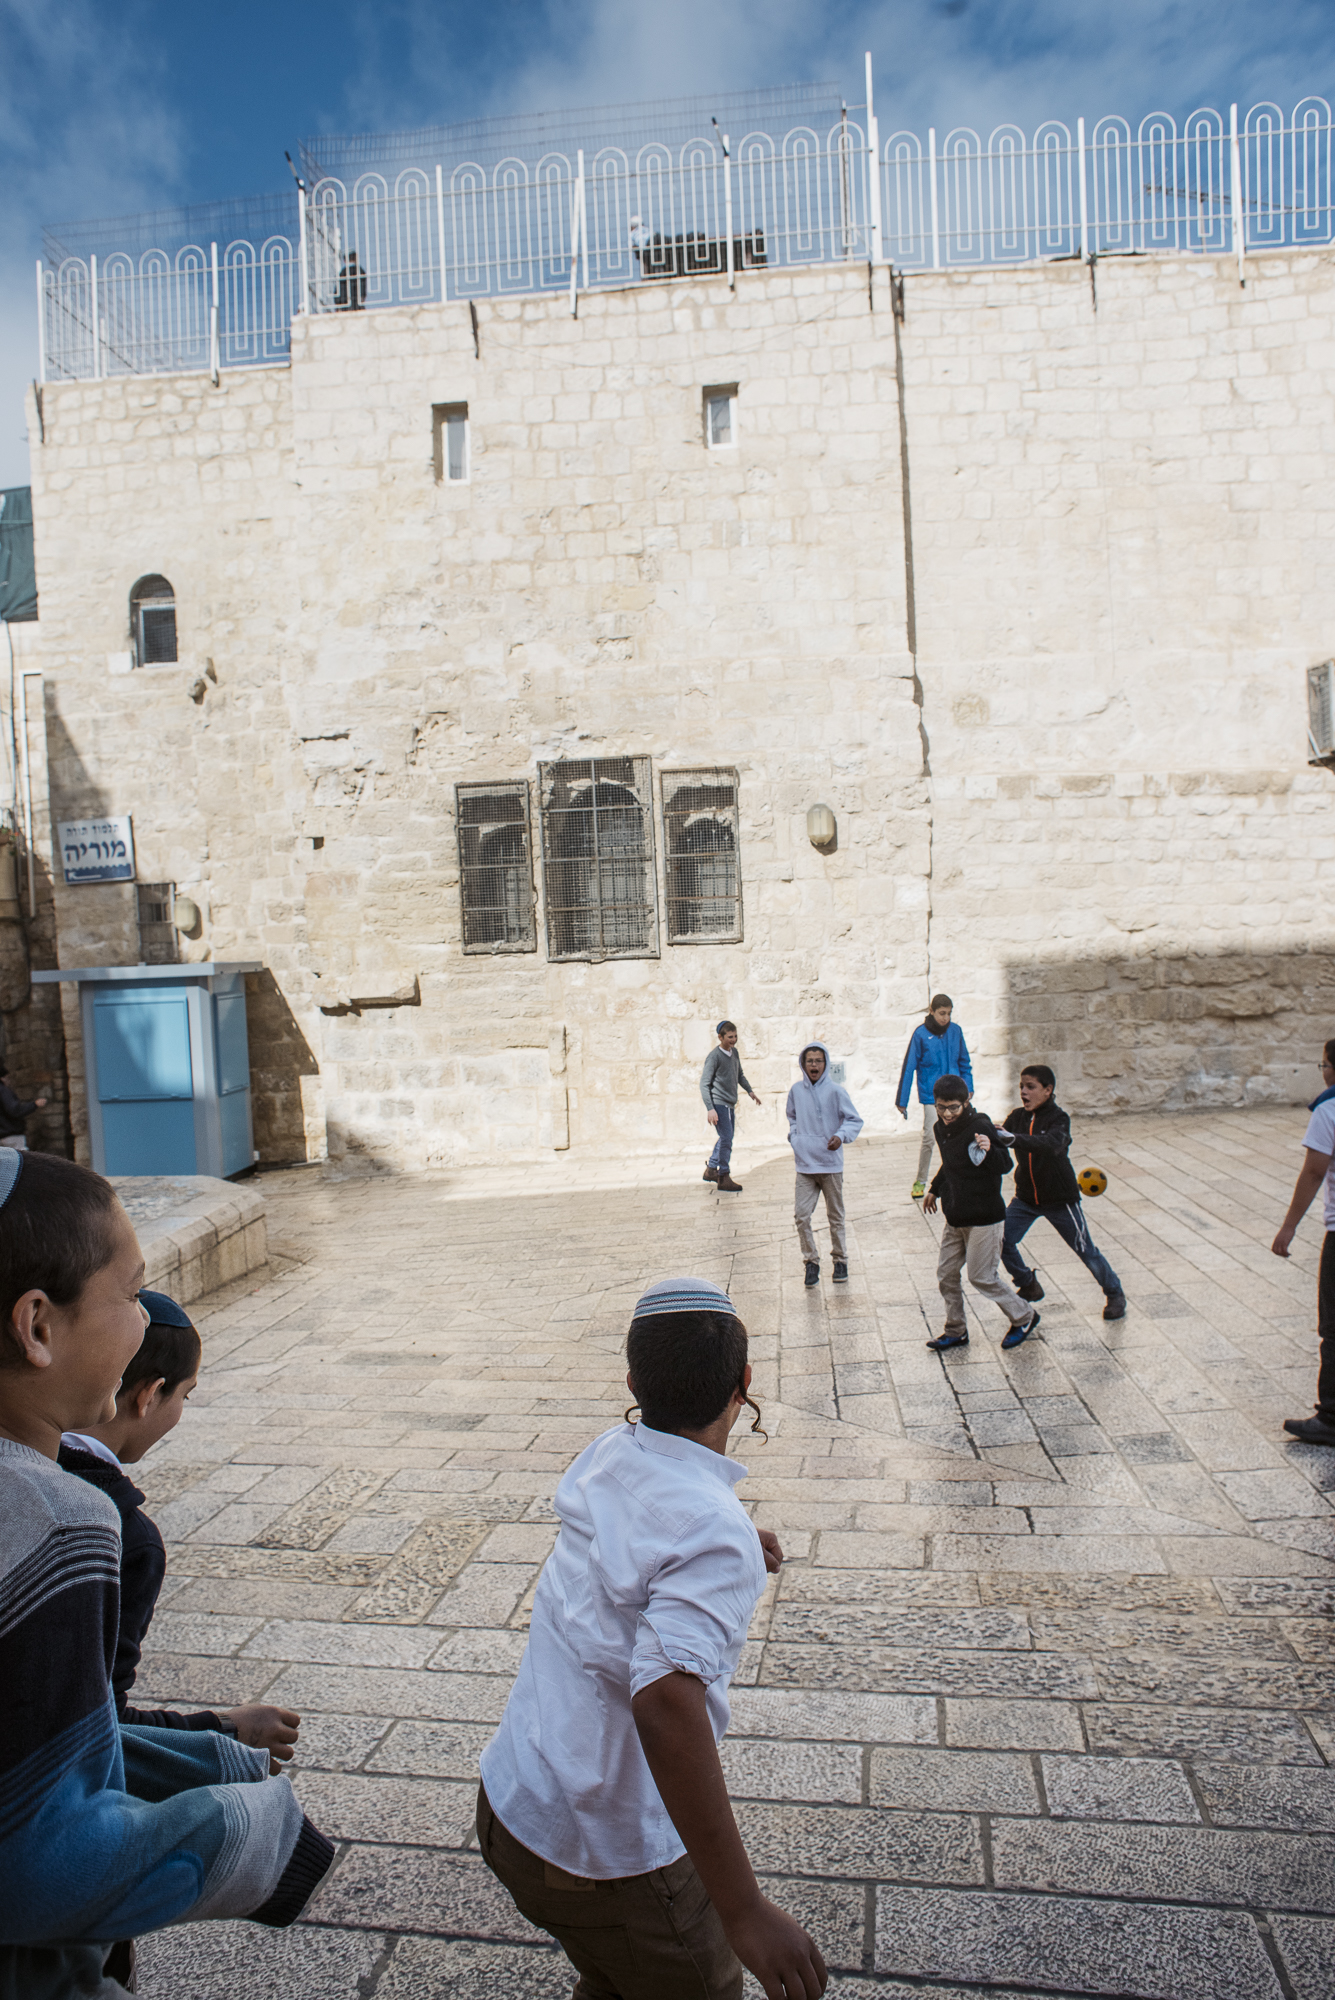 israel jack sorokin middle east photography fine art travel jewish judaism rocks jerusalem kids playing